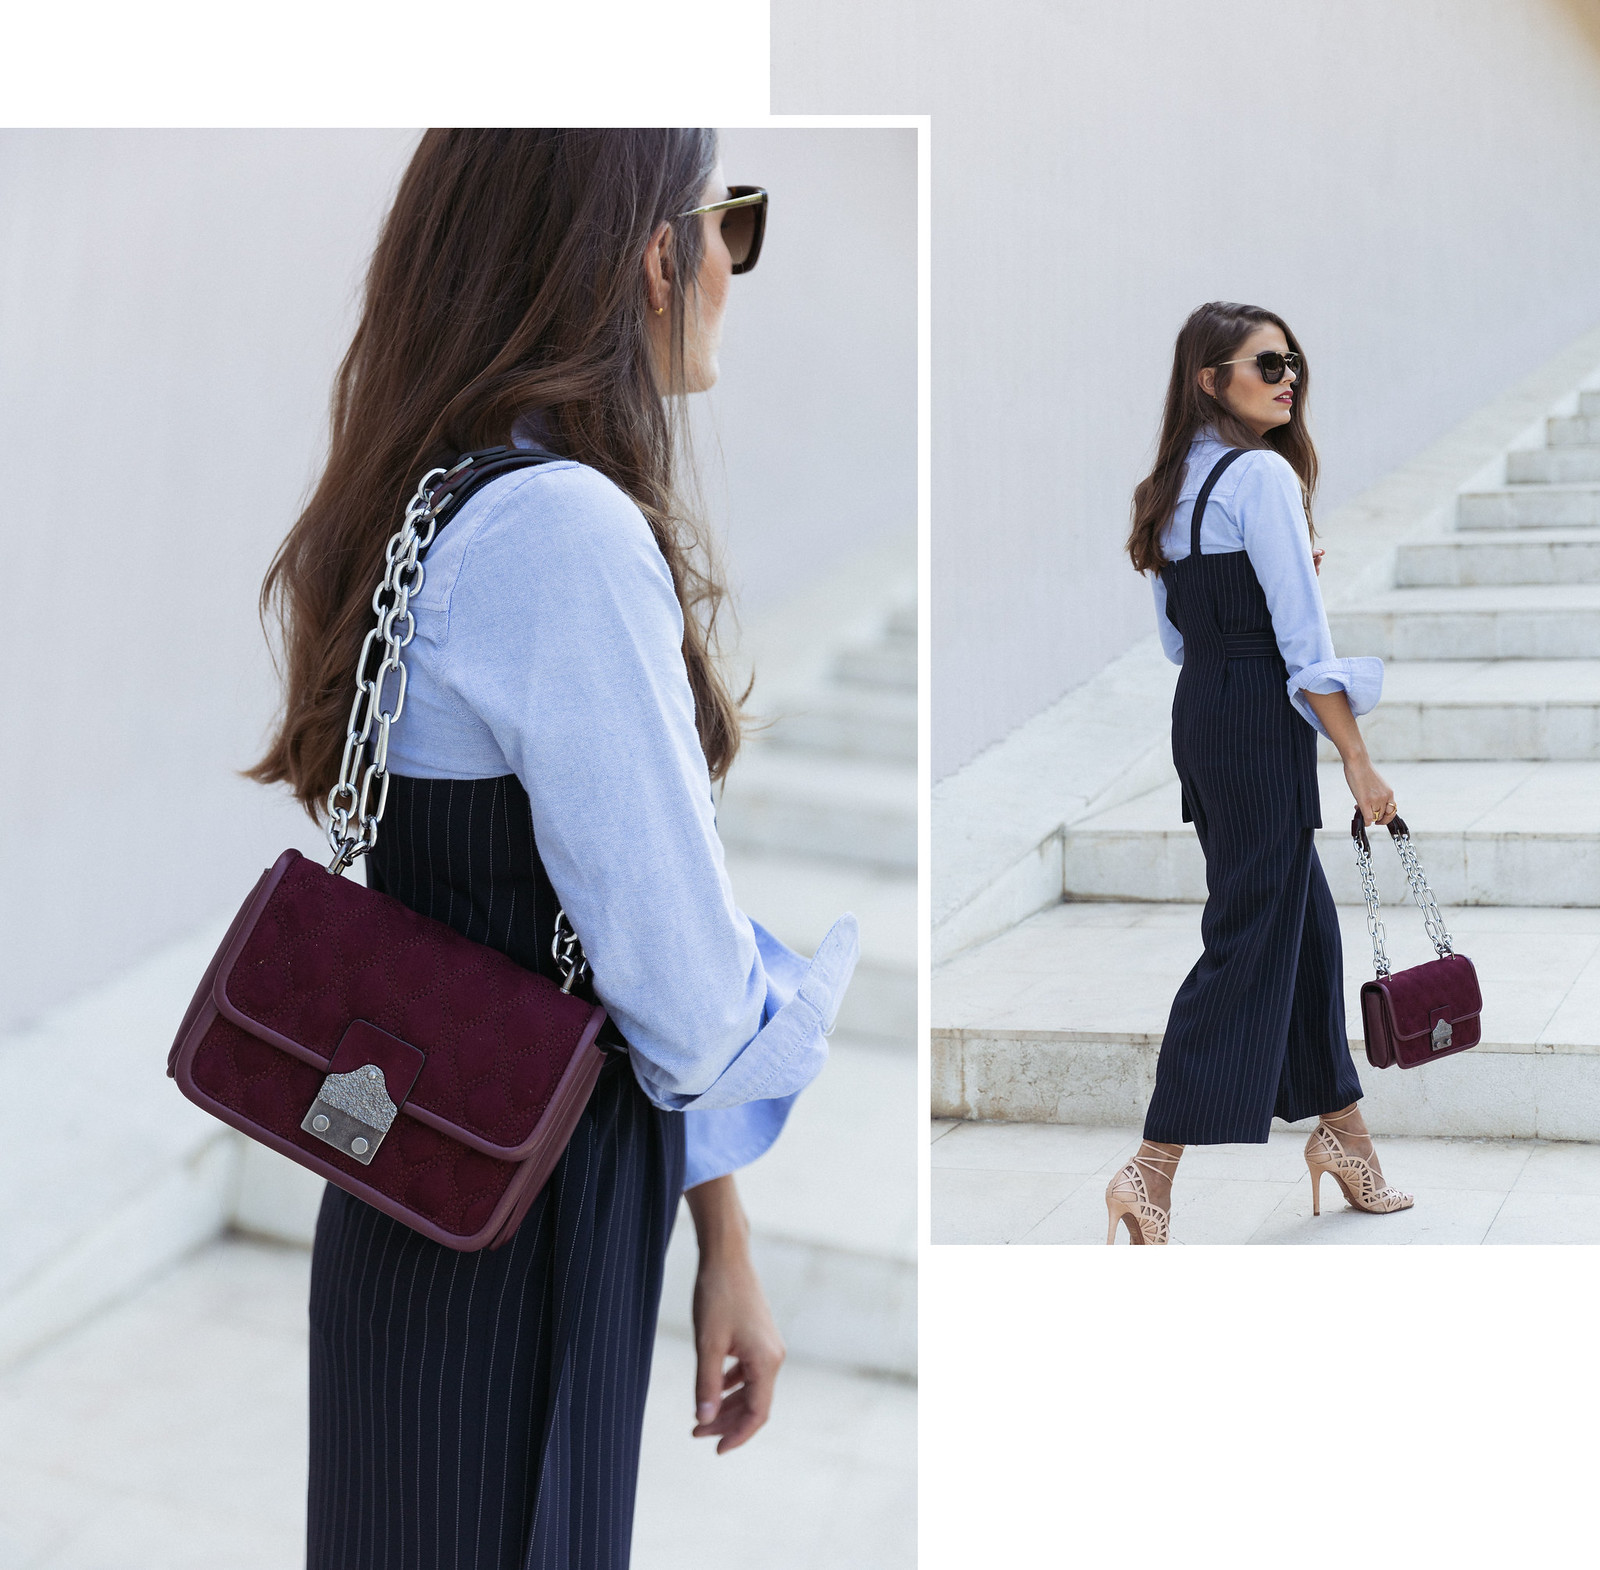 Jessie Chanes Seams for a desire - Pinstripped suit topshop heeled sandals schutz parfois bag  -3